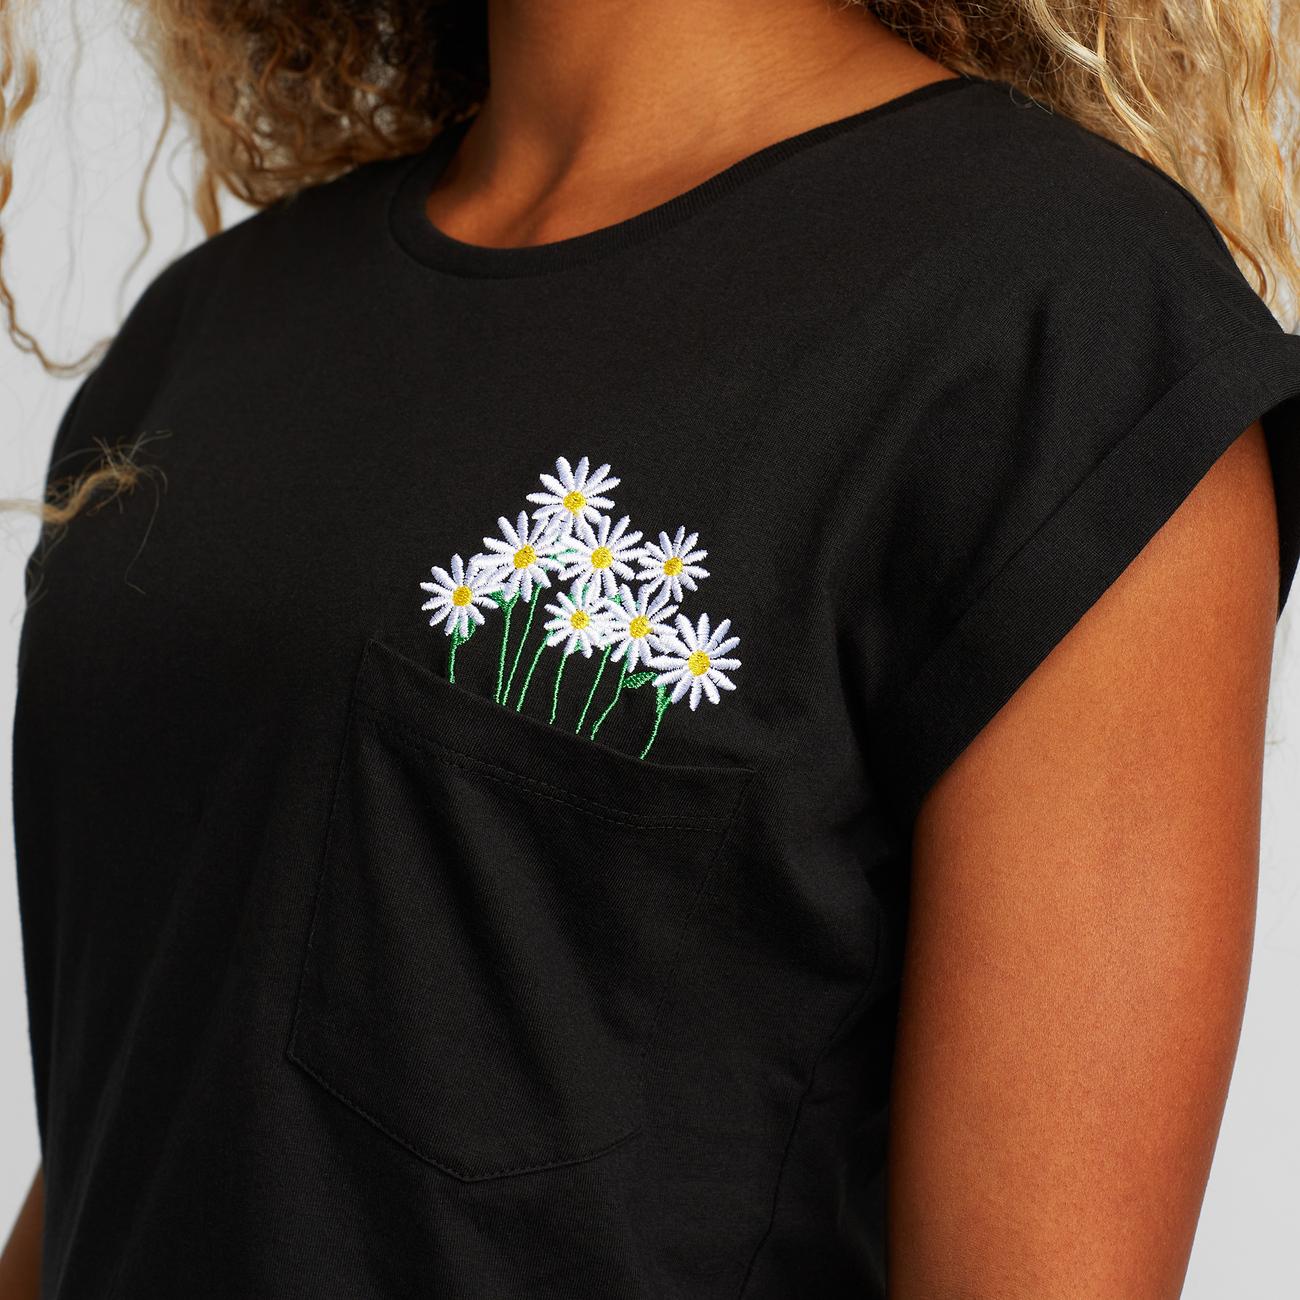 Dedicated - T-shirt Visby Flower Pocket Black